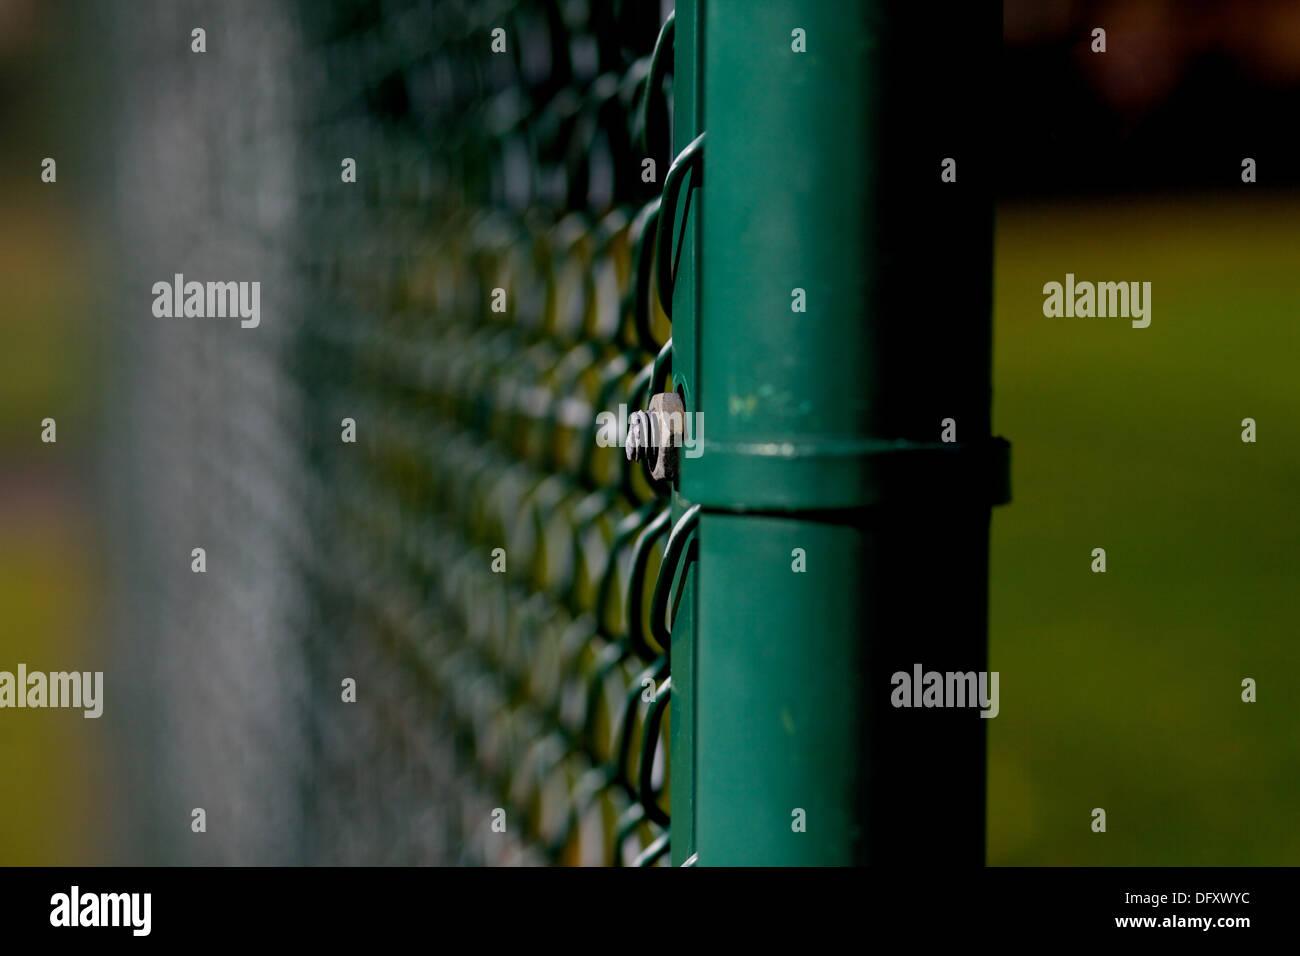 Primer plano de cercas de alambre Imagen De Stock